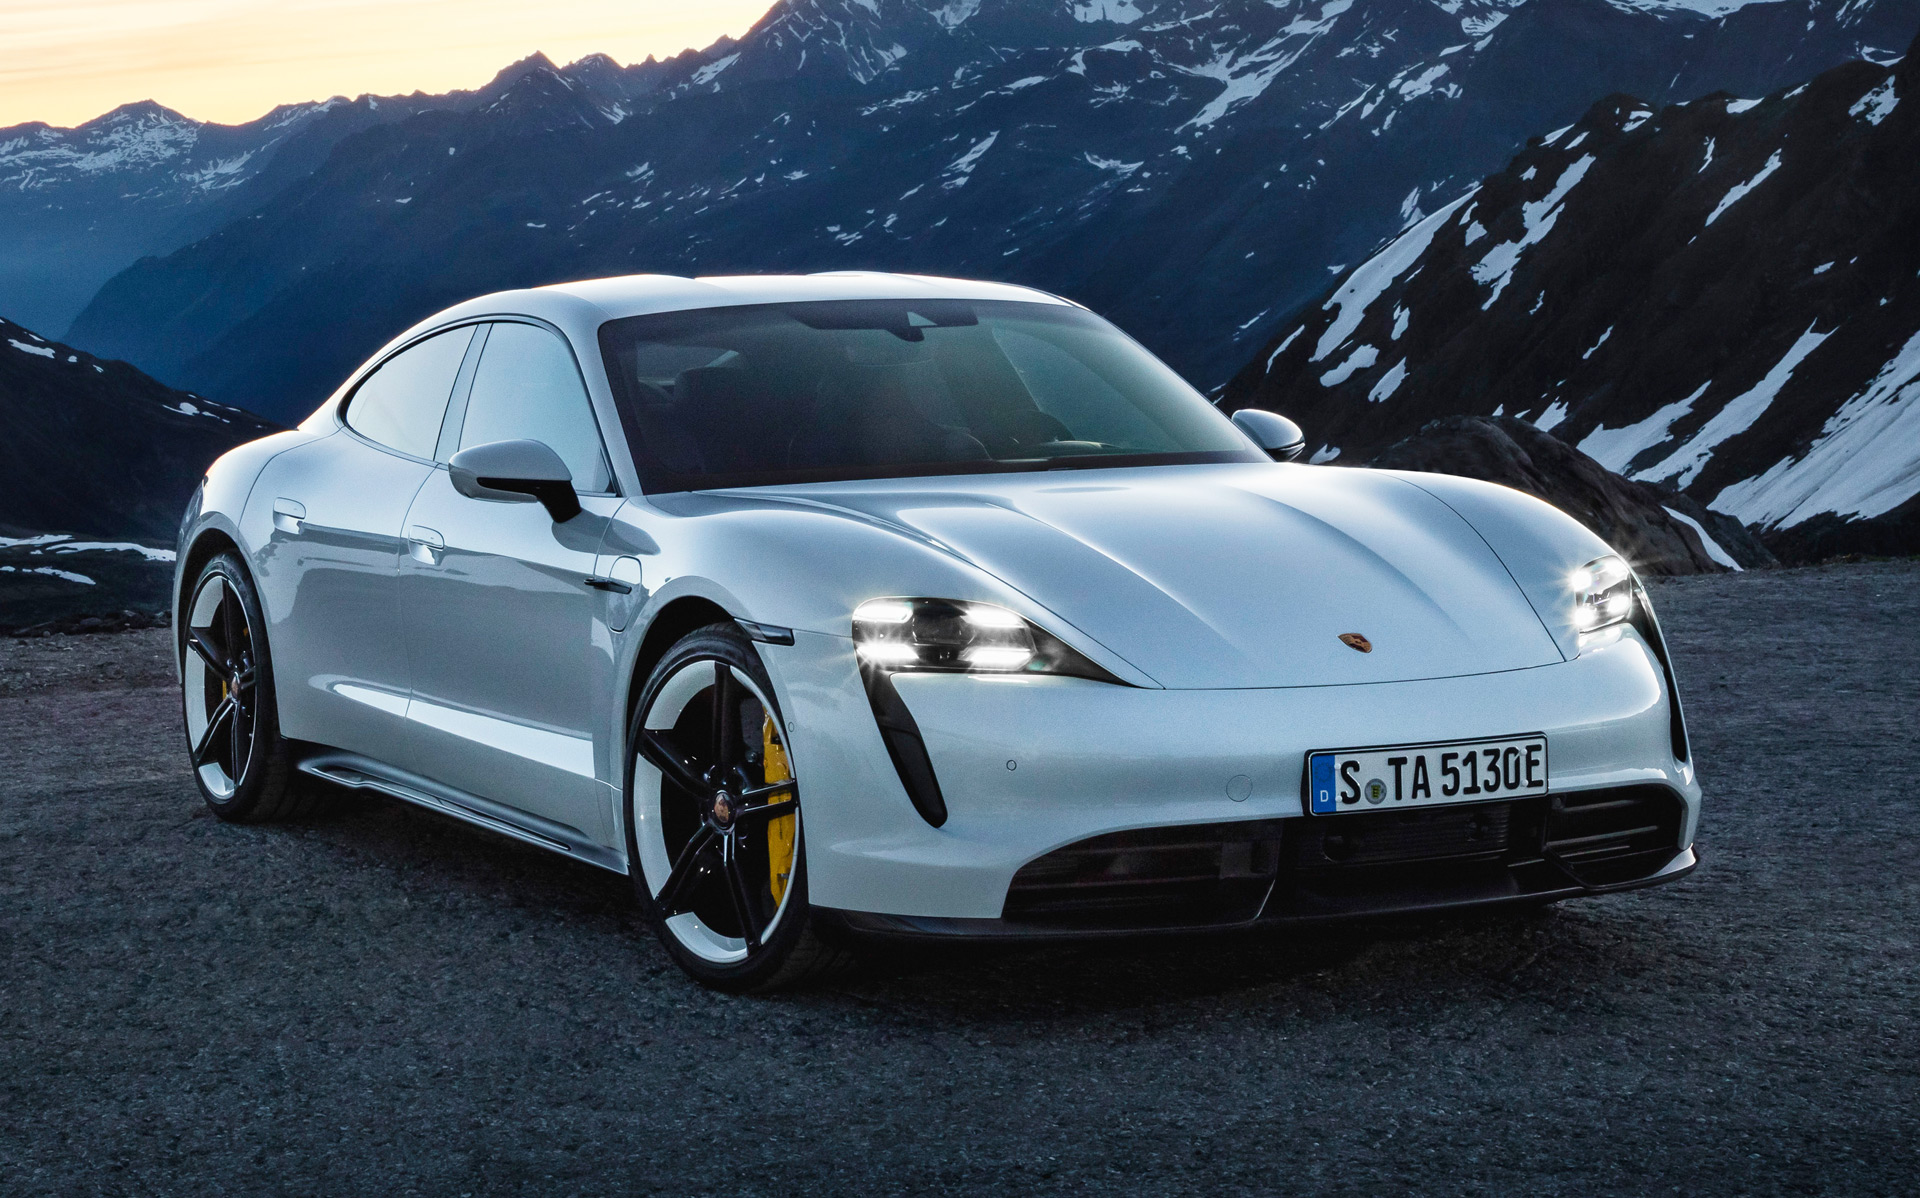 2020 Porsche Taycan Turbo S has less than 200 miles of range